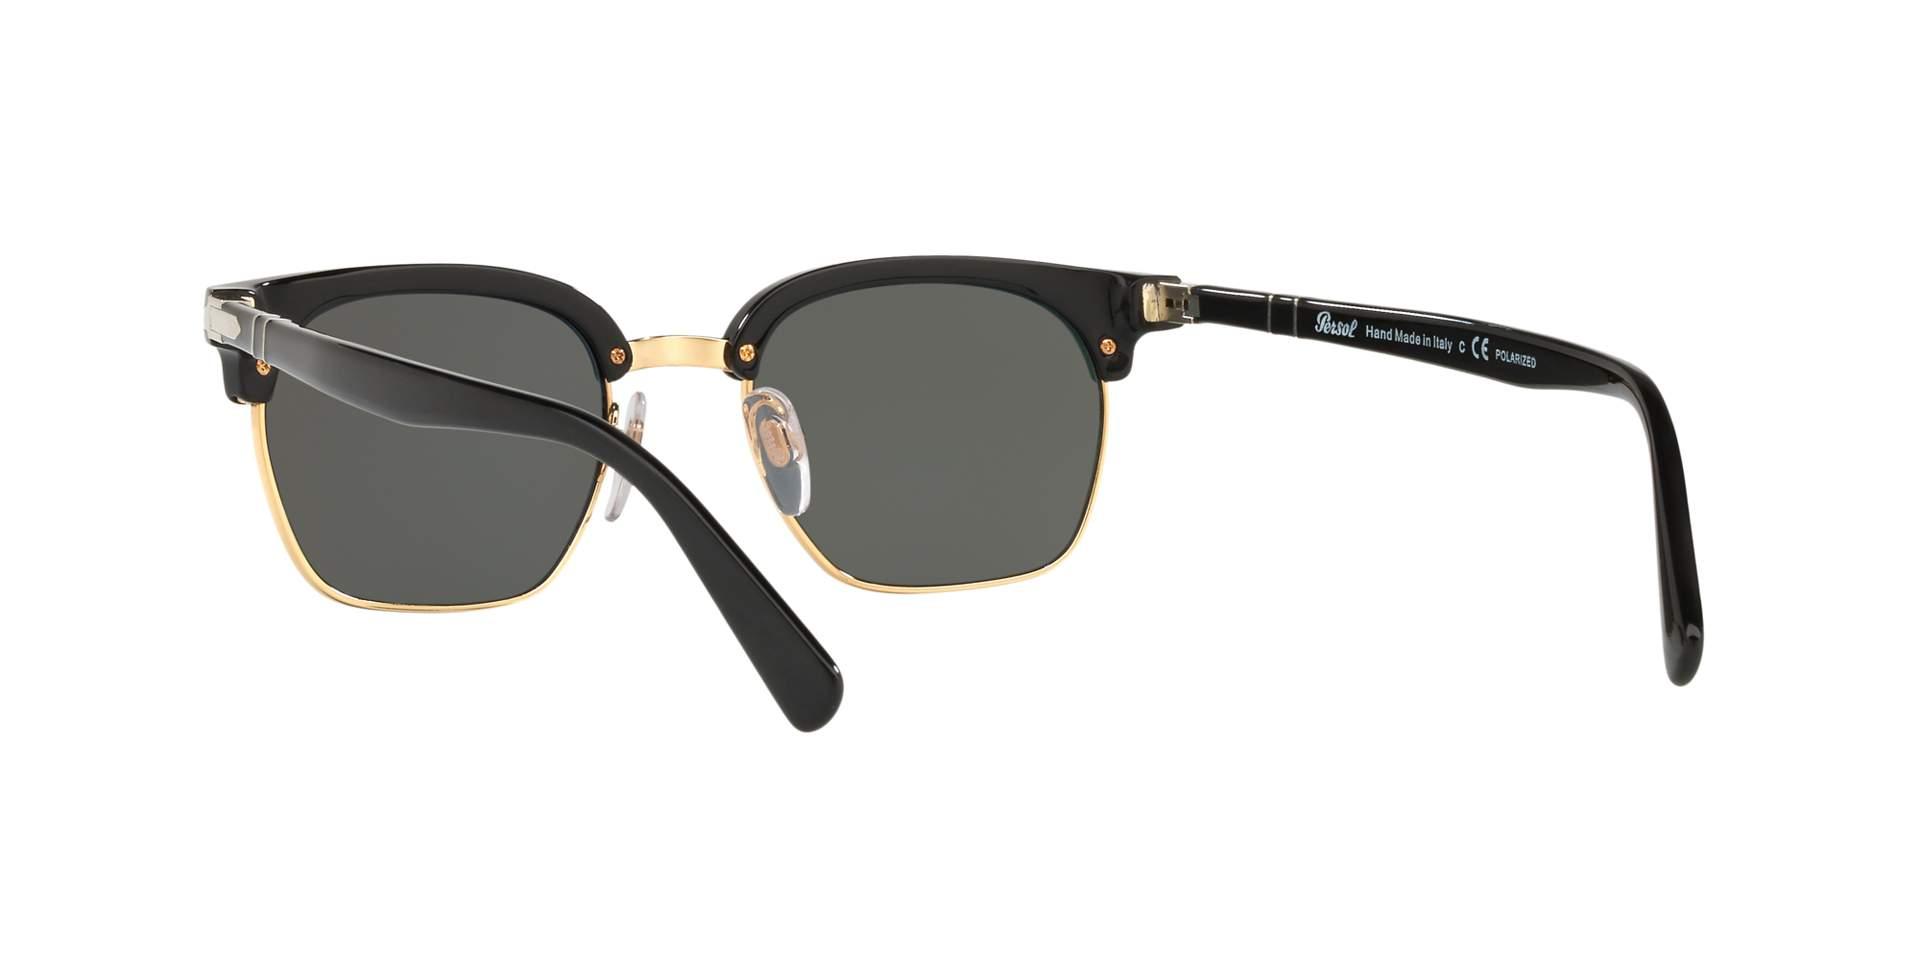 540ca45d84 Sunglasses Persol Tailoring edition Black PO3199S 95 58 53-20 Large  Polarized